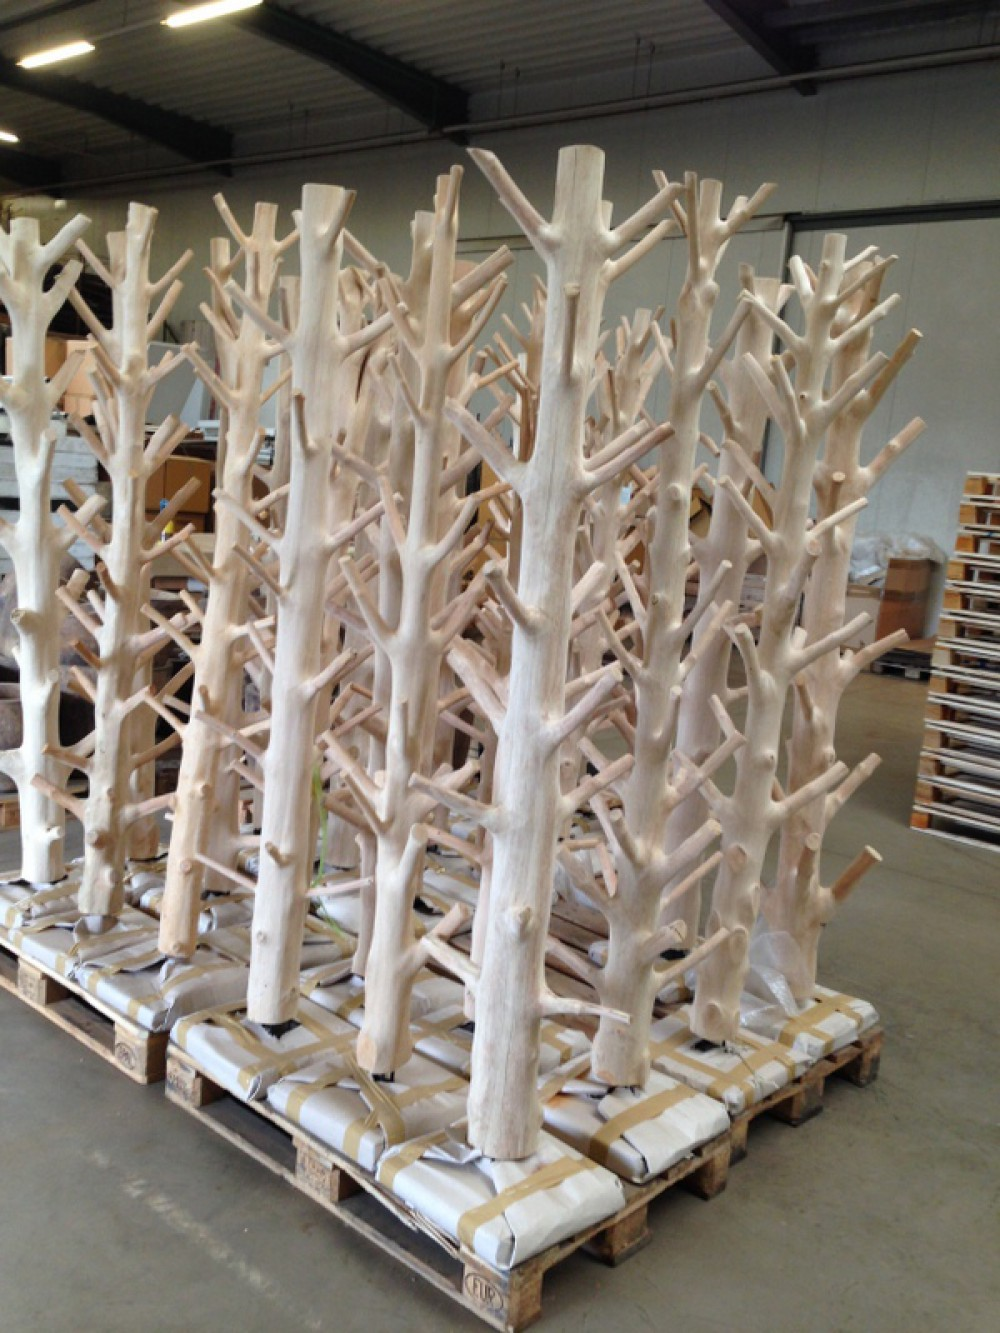 wandgarderobe baumstamm standgarderobe aus massivholz h he 200 cm. Black Bedroom Furniture Sets. Home Design Ideas